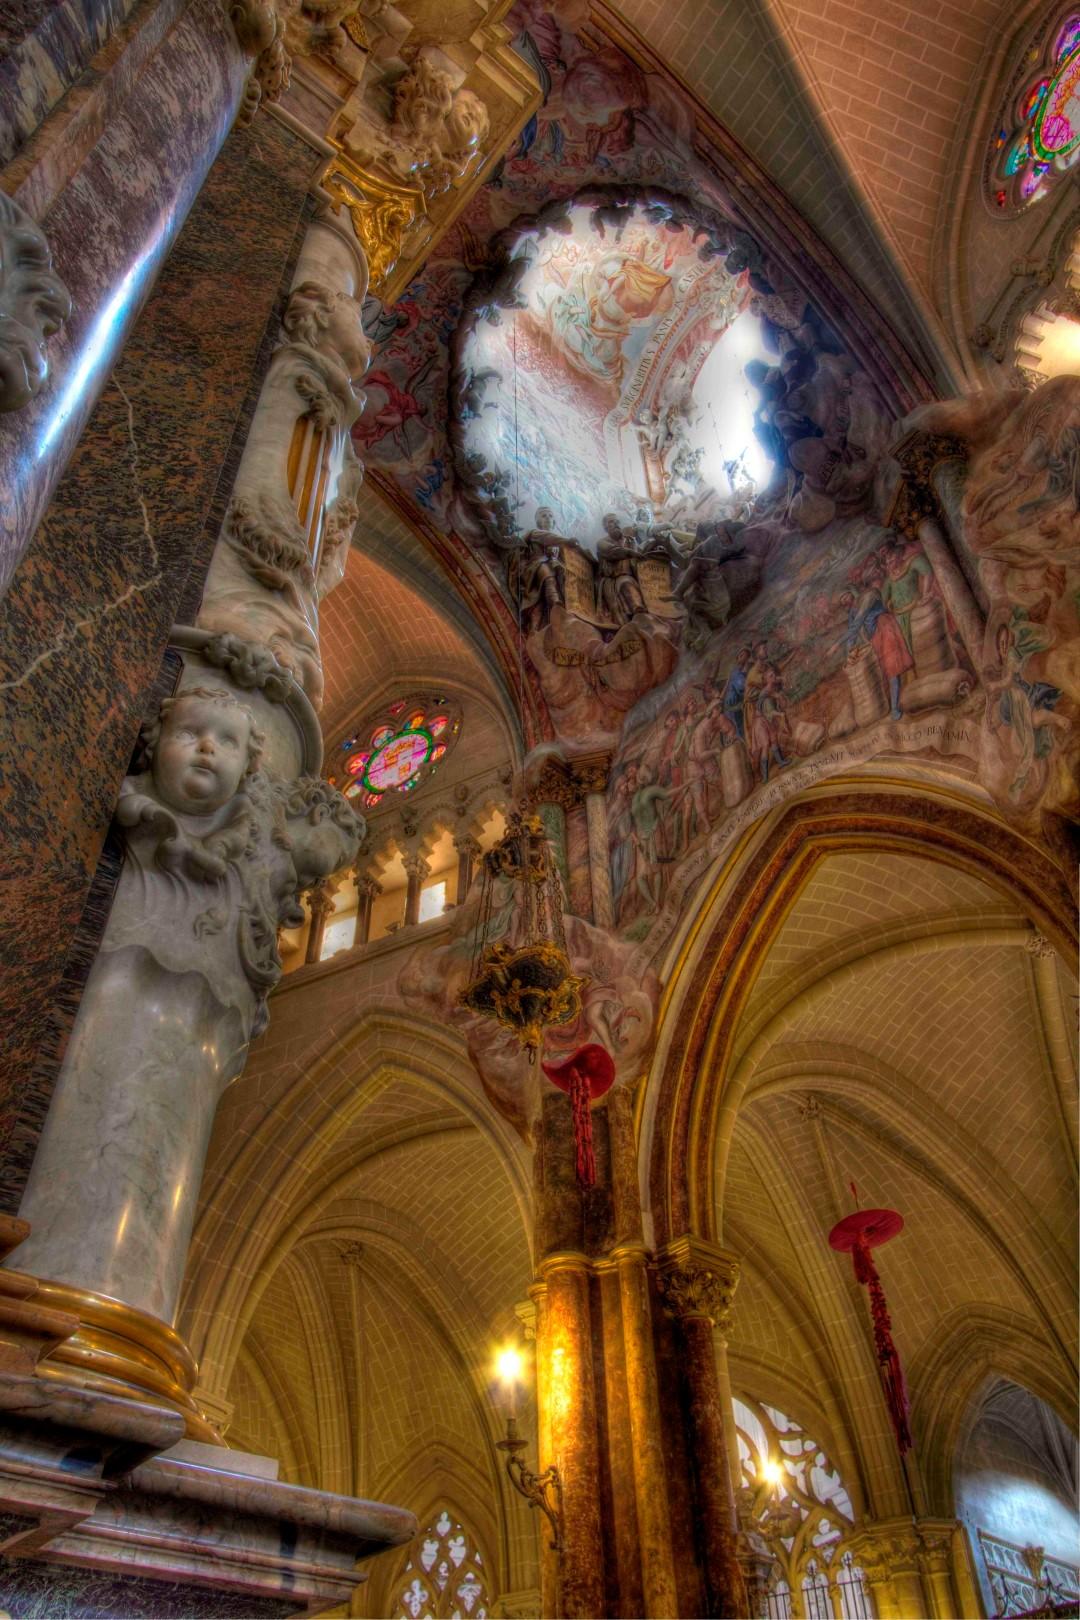 Toledo cathedral, oculus, Spain, Travelers Roundtable, Robert Bundy